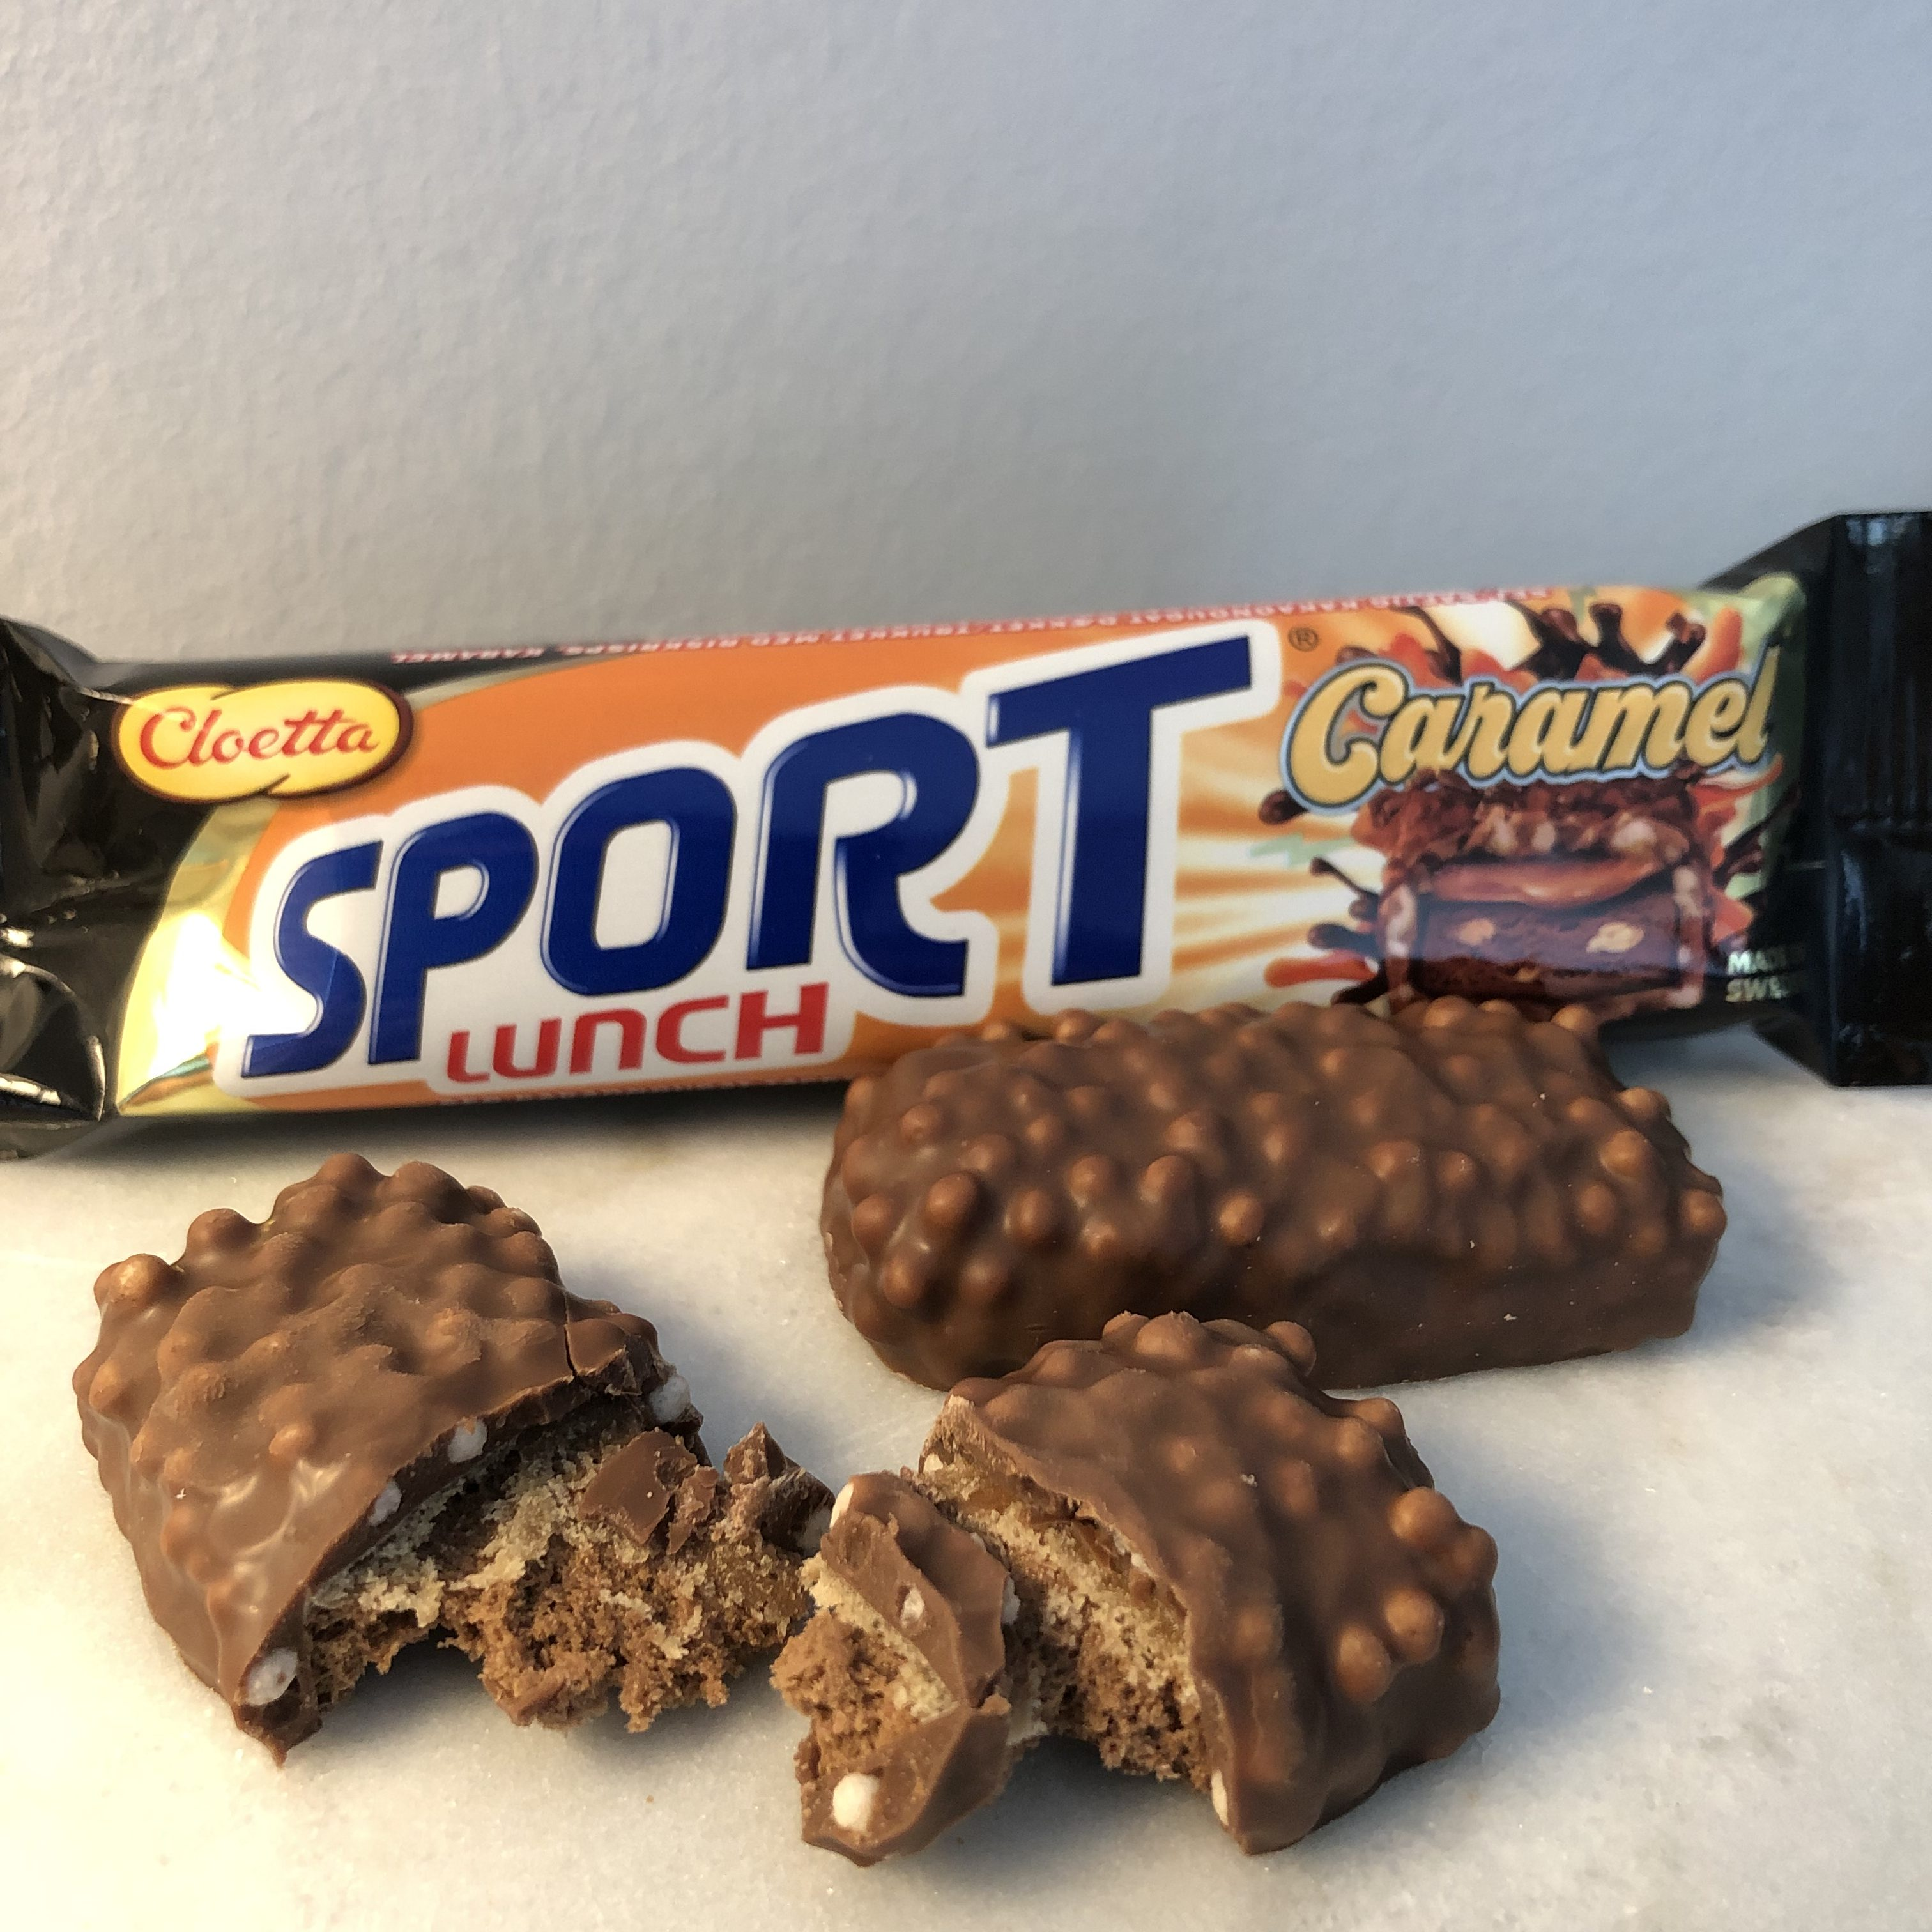 Cloetta Sportlunch Caramel